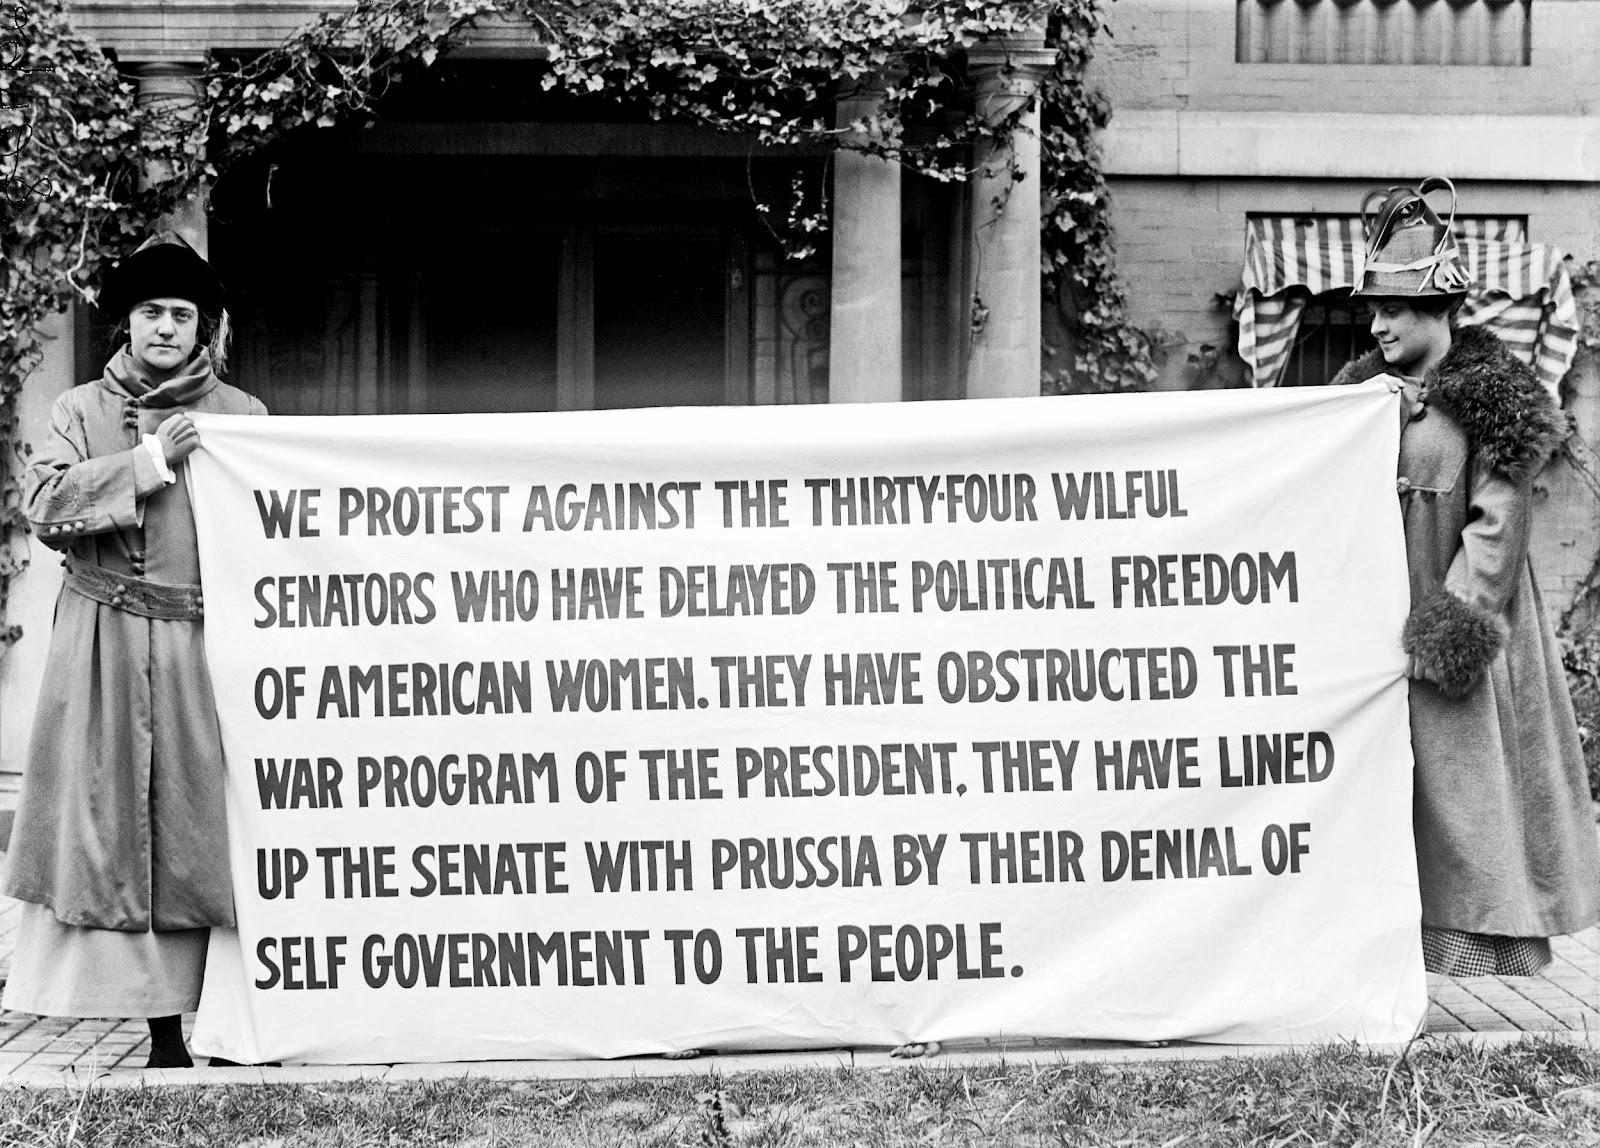 Suffragettes with banner, 1918.jpg